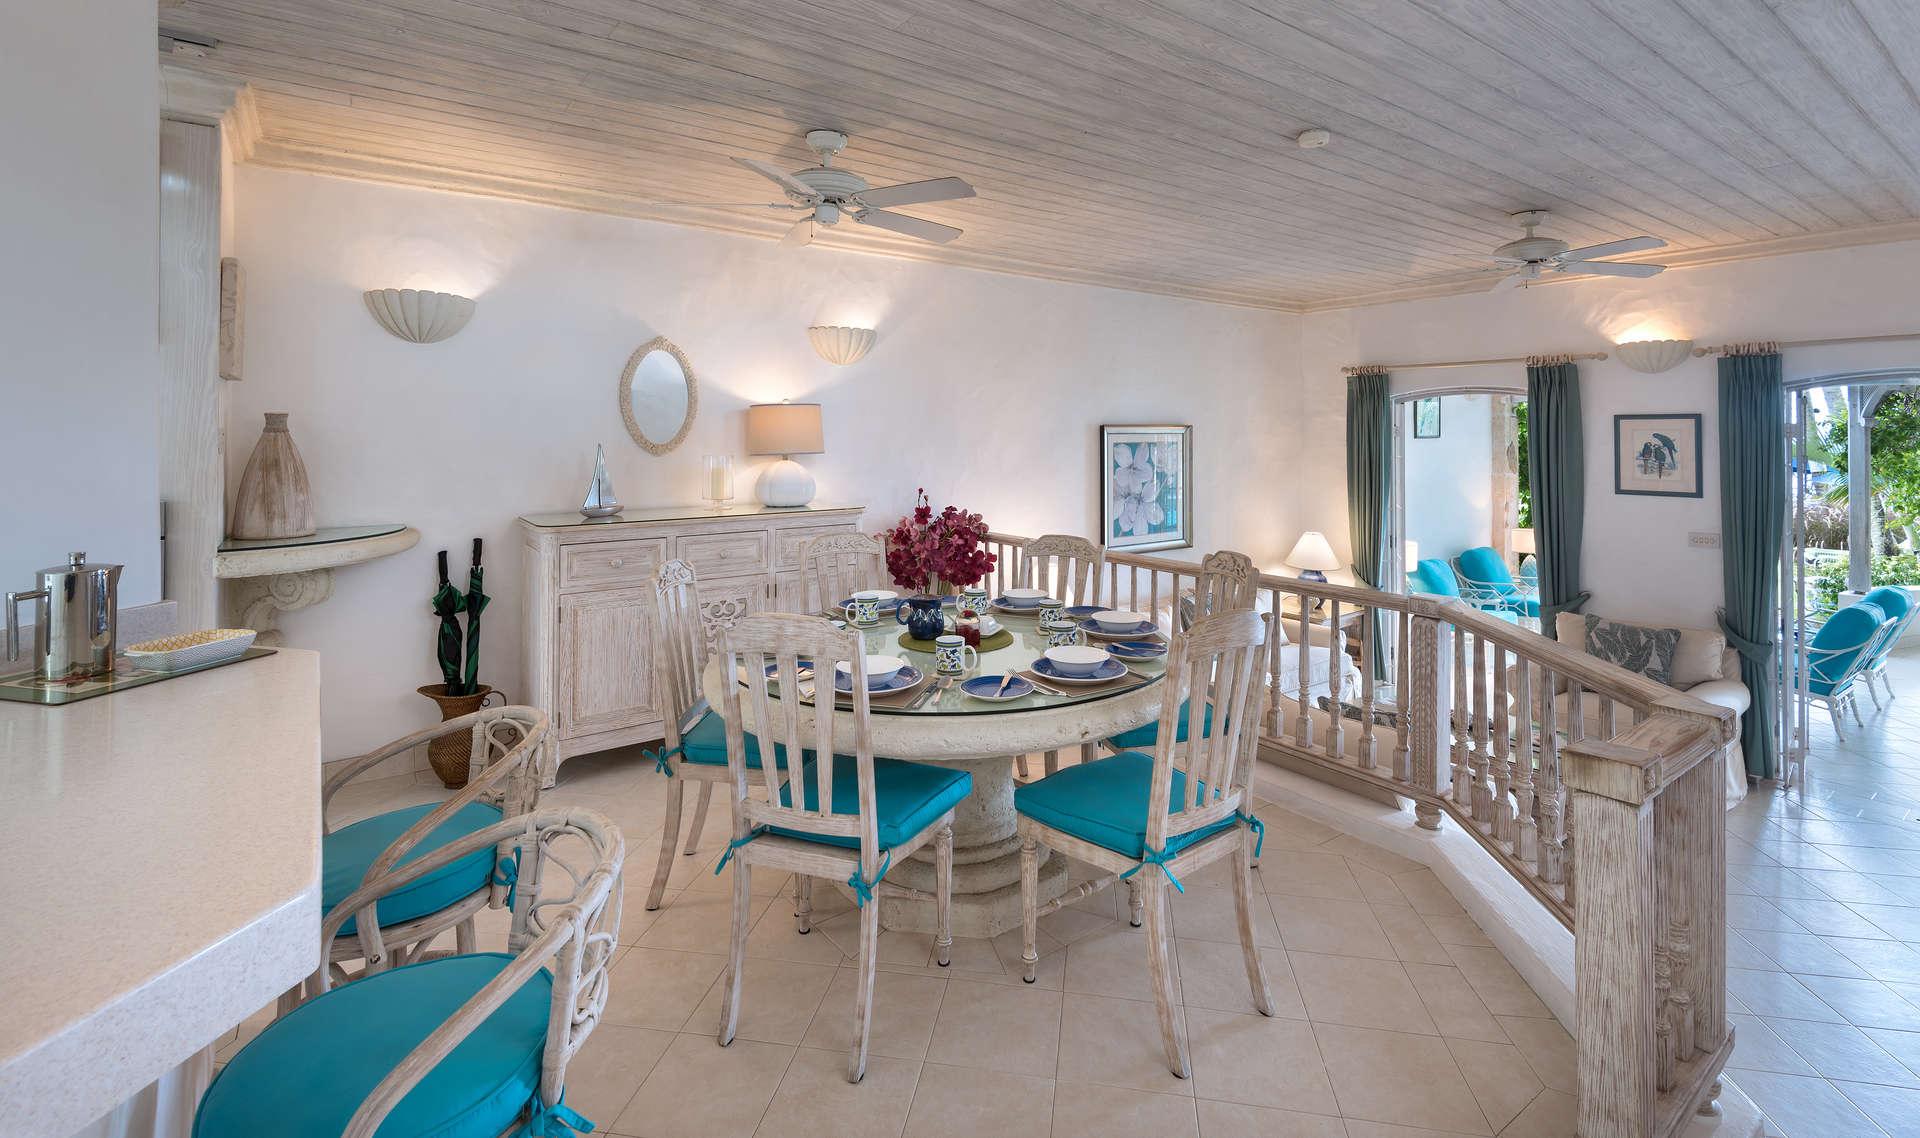 Luxury villa rentals caribbean - Barbados - St peter - Gibbes - Emerald Beach 1 | Solandra - Image 1/14